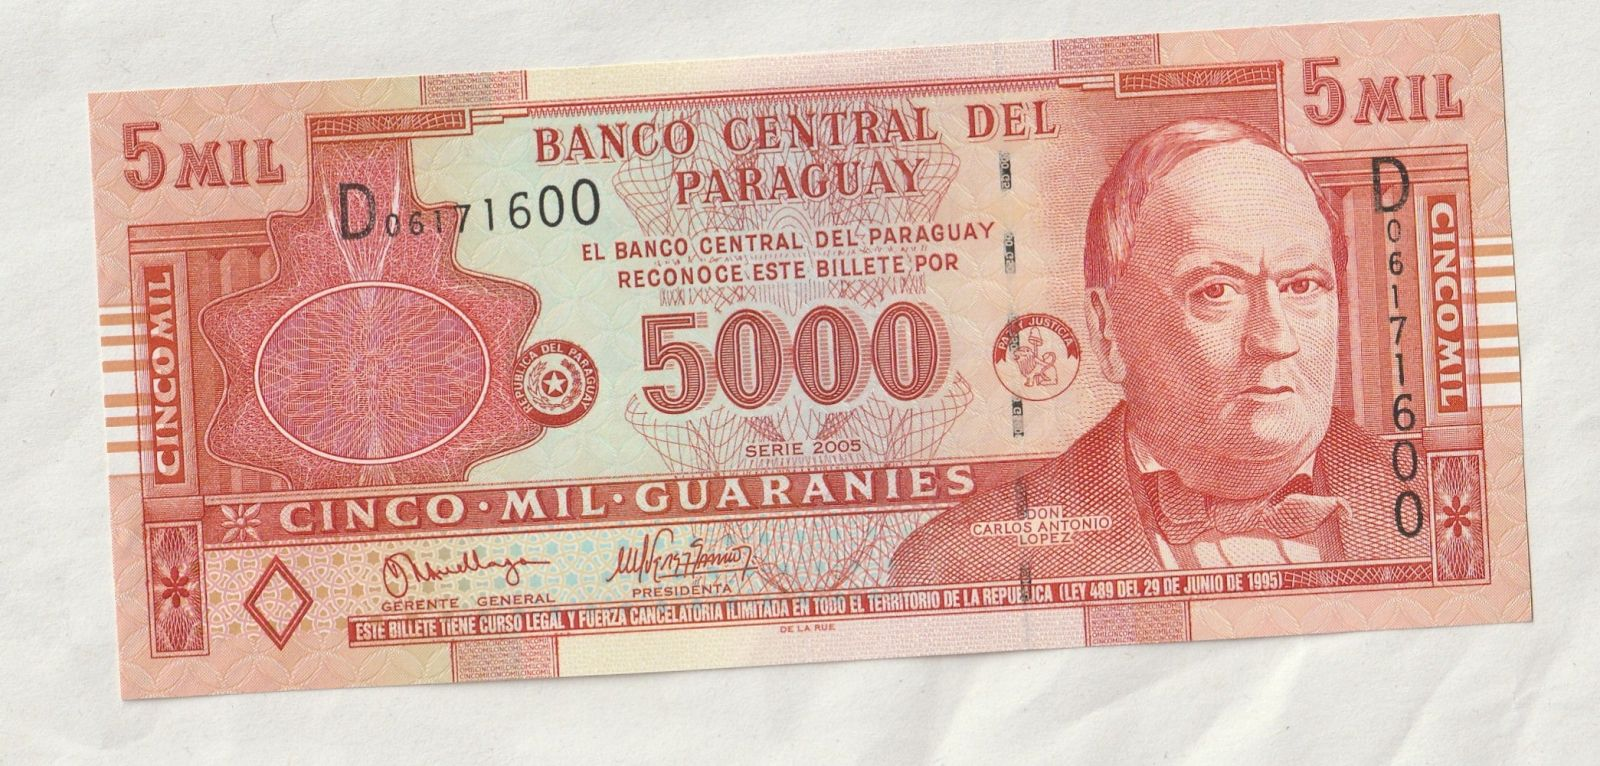 5000 Guaranies, 2005, Paraguay